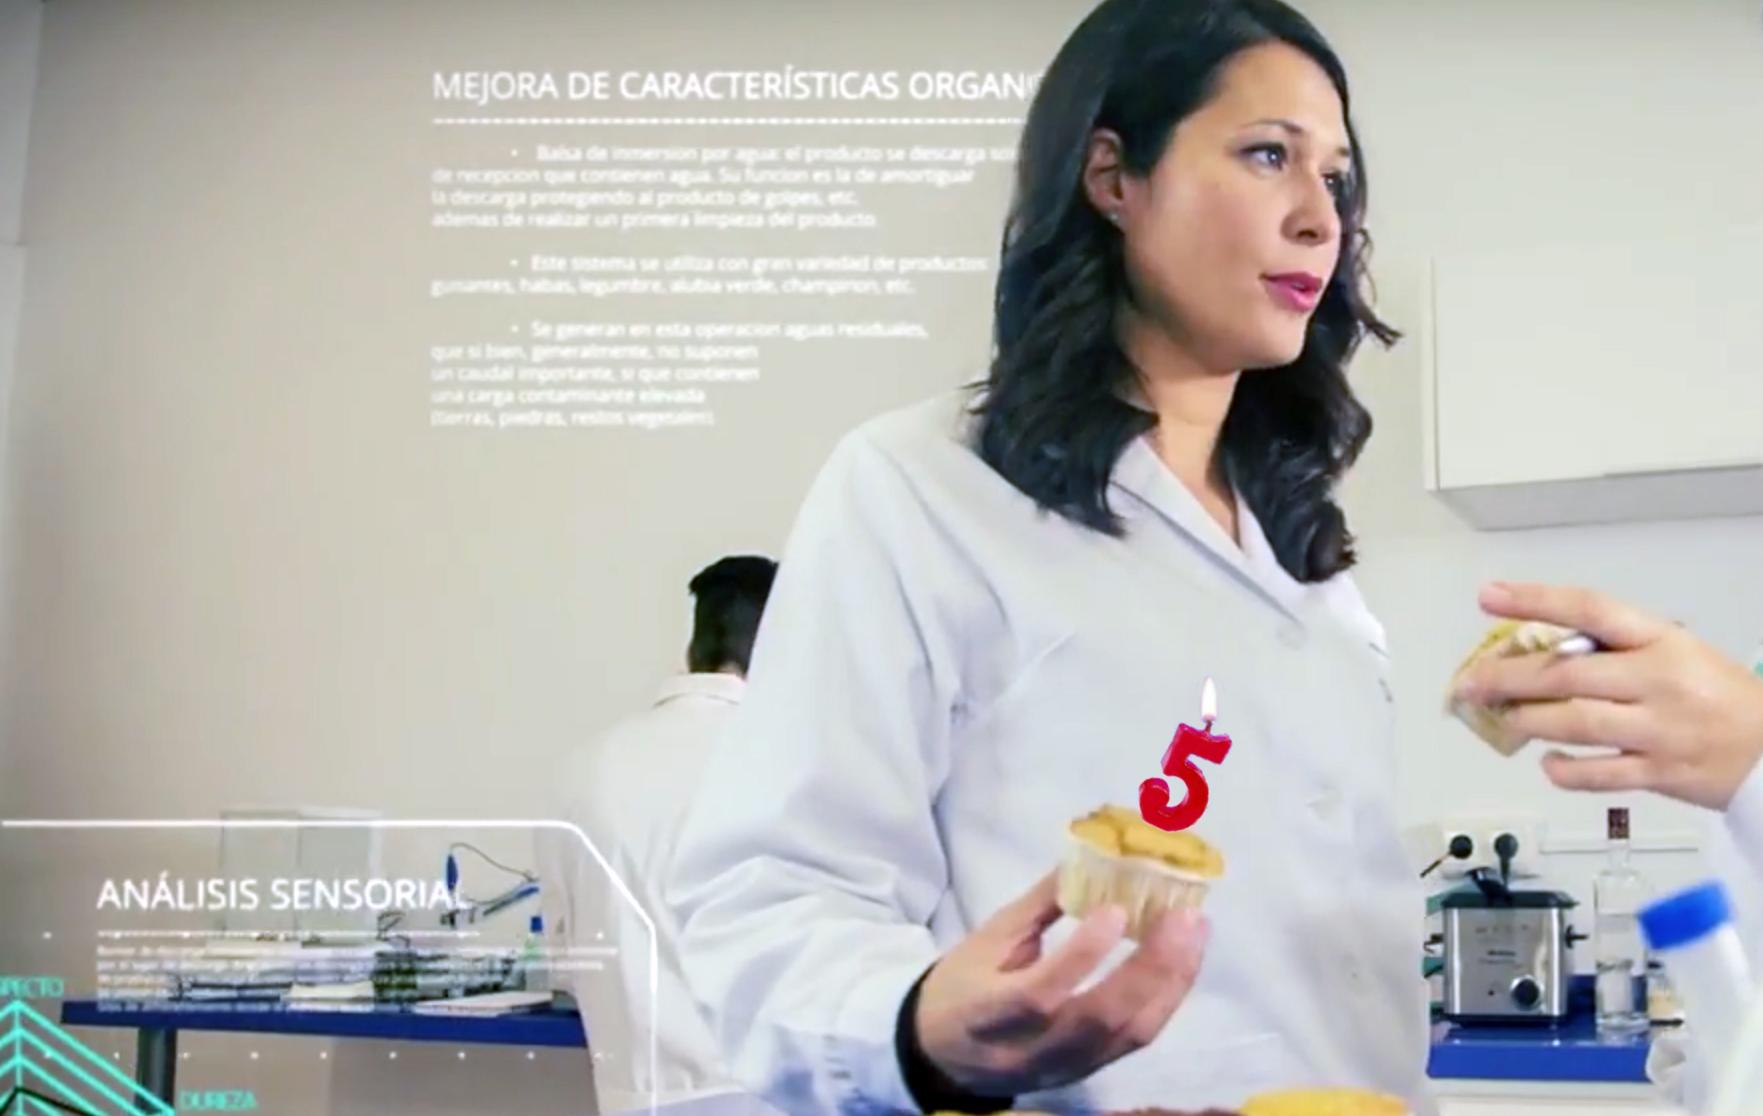 sigma-biotech-cumplimos-5-anos-estamos-felices